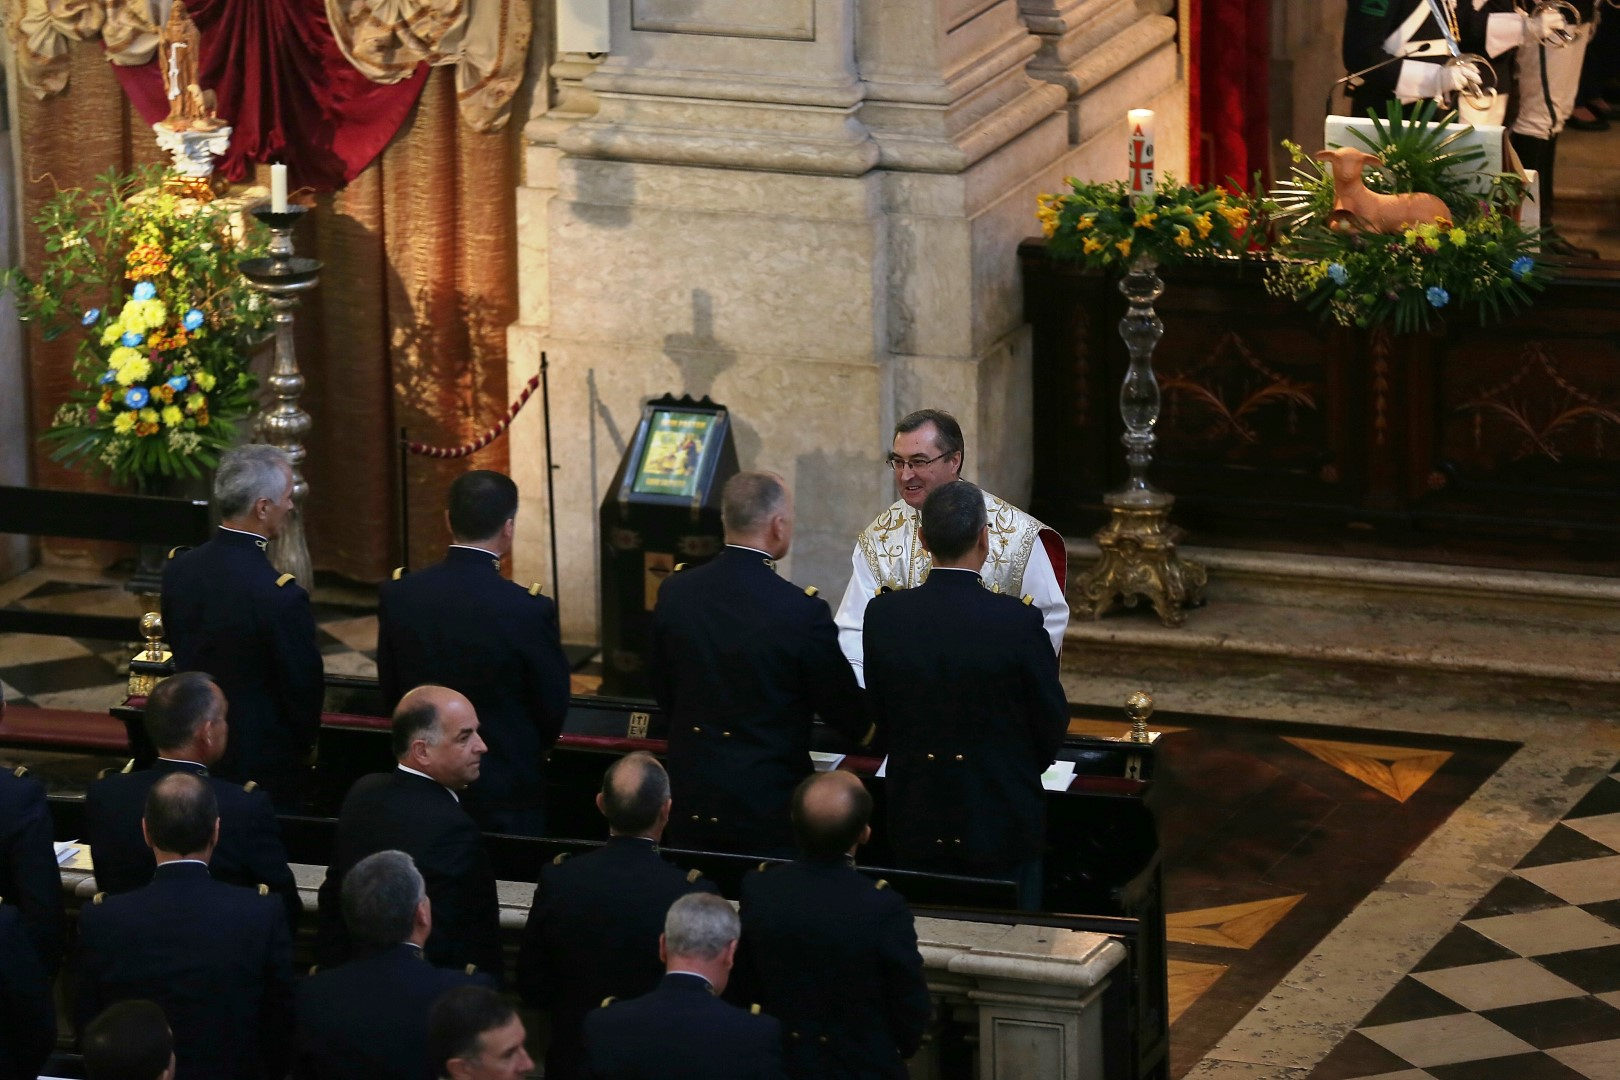 GNR_Missa na Basílica dos Mártires_Lisboa_29ABR15_1